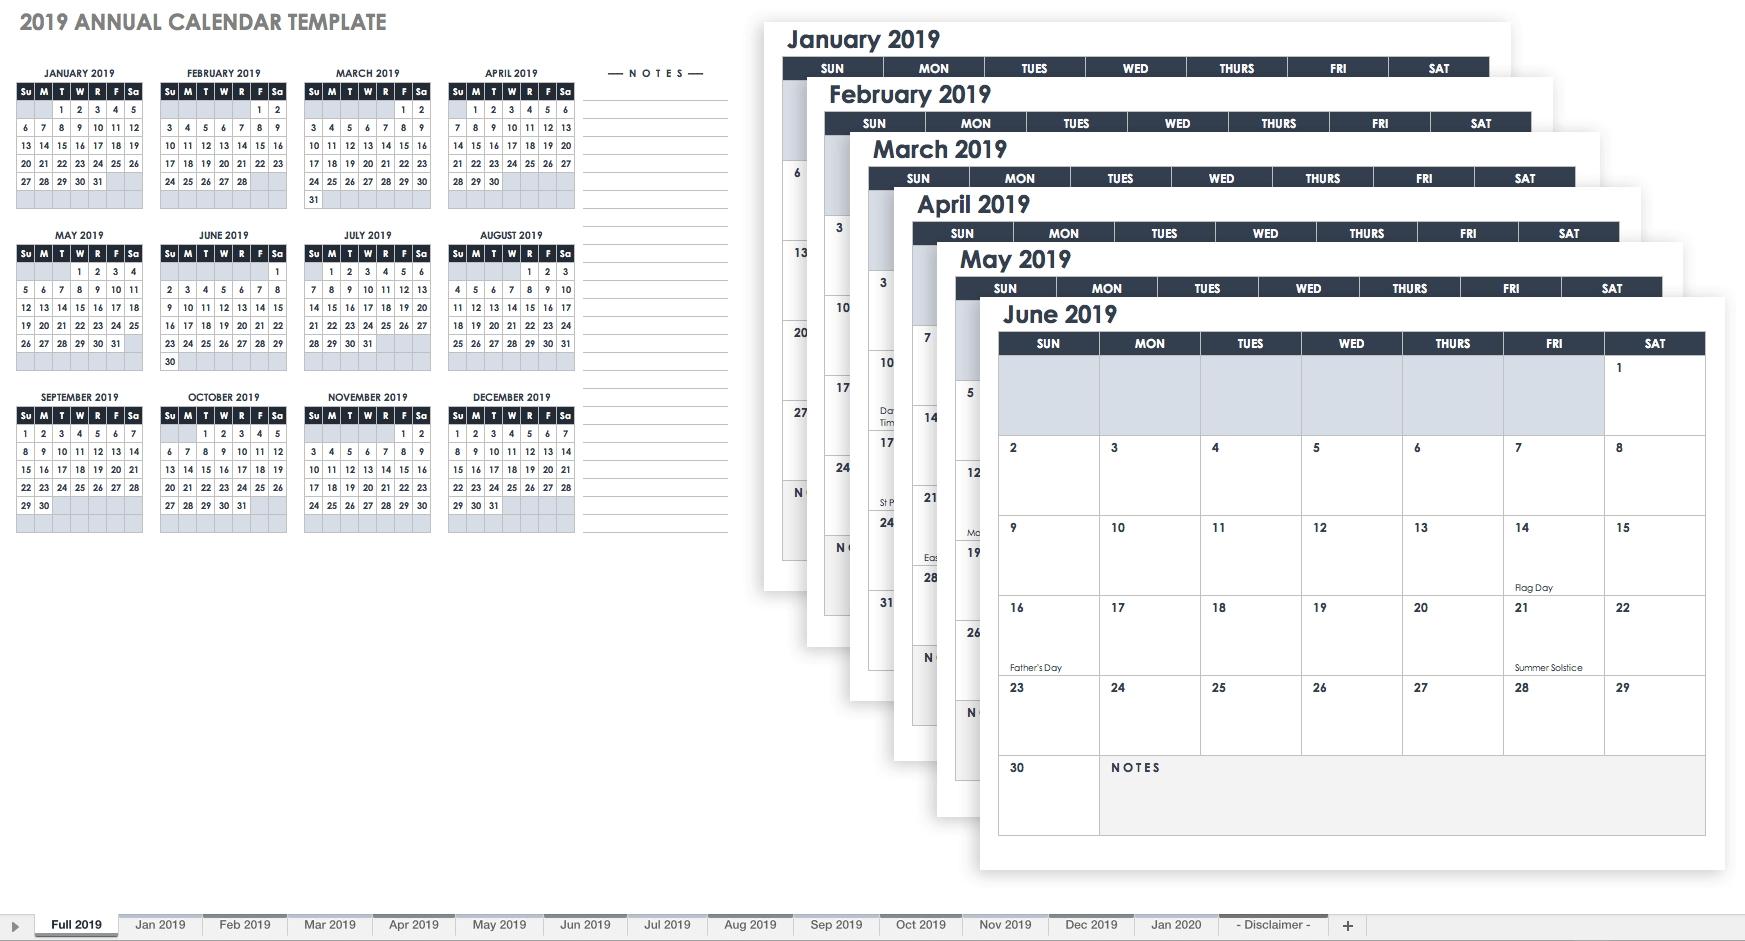 15 Free Monthly Calendar Templates | Smartsheet inside Printable Blank Weekly Calendars Templates